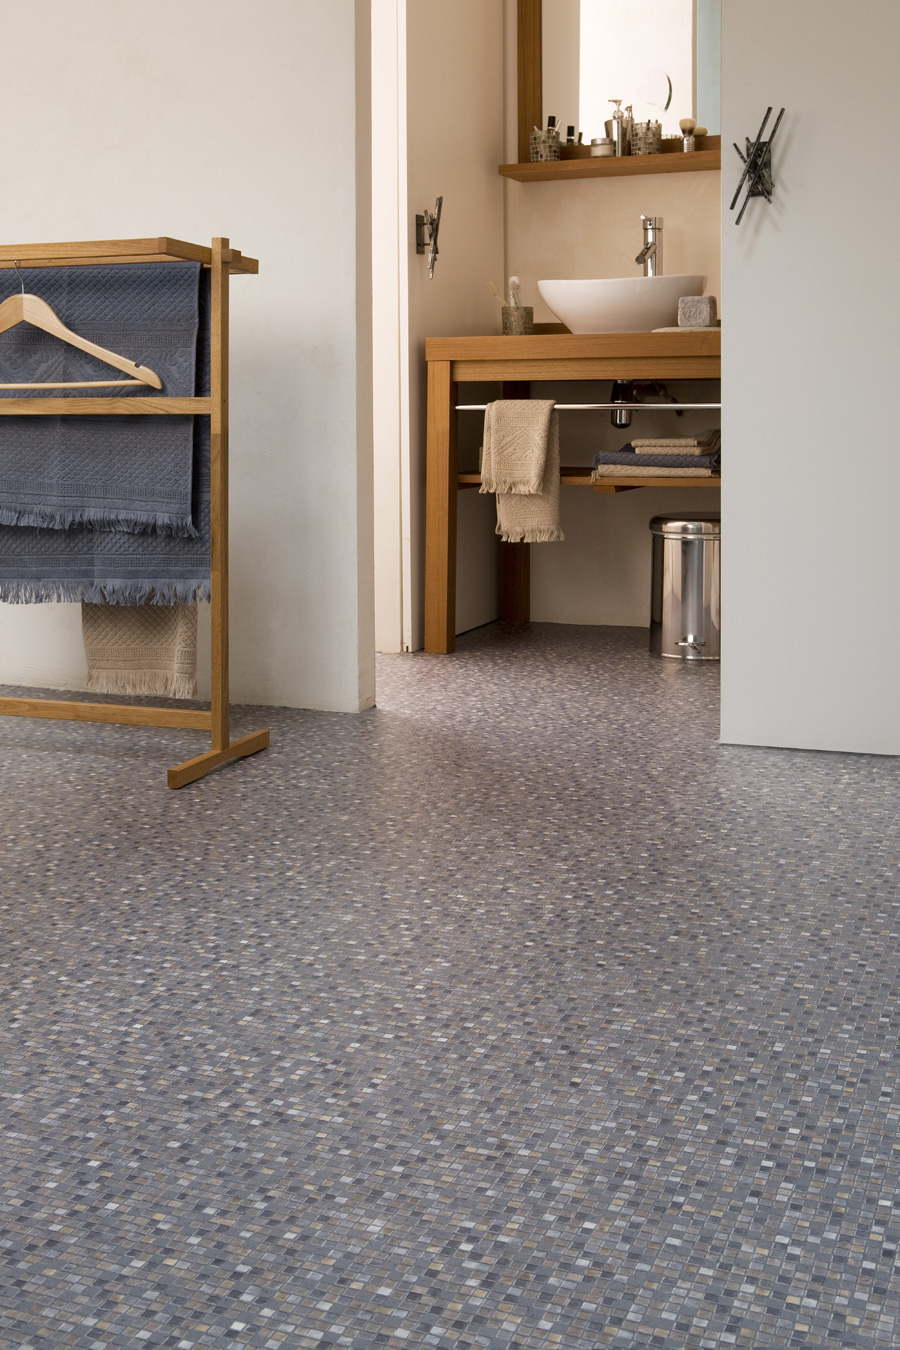 Commercial Vinyl Flooring Buy High Quality Vinyl Flooring